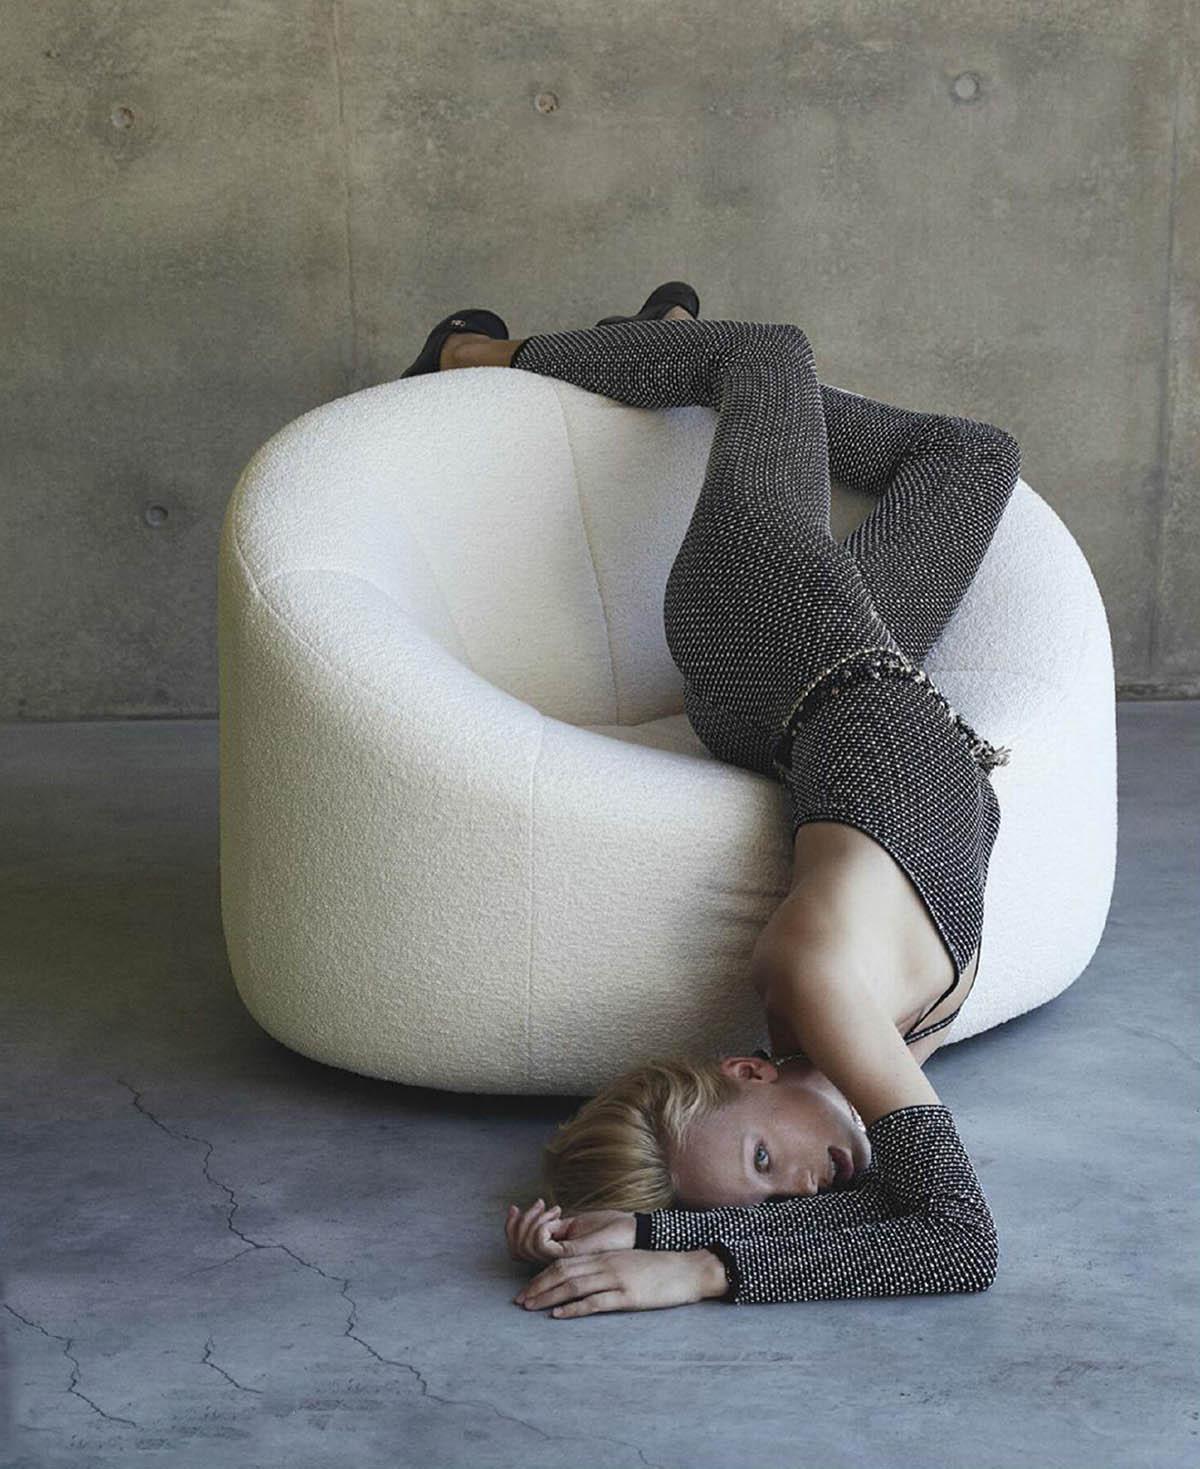 Lili Sumner by Hannah Scott-Stevenson for Vogue Australia April 2021